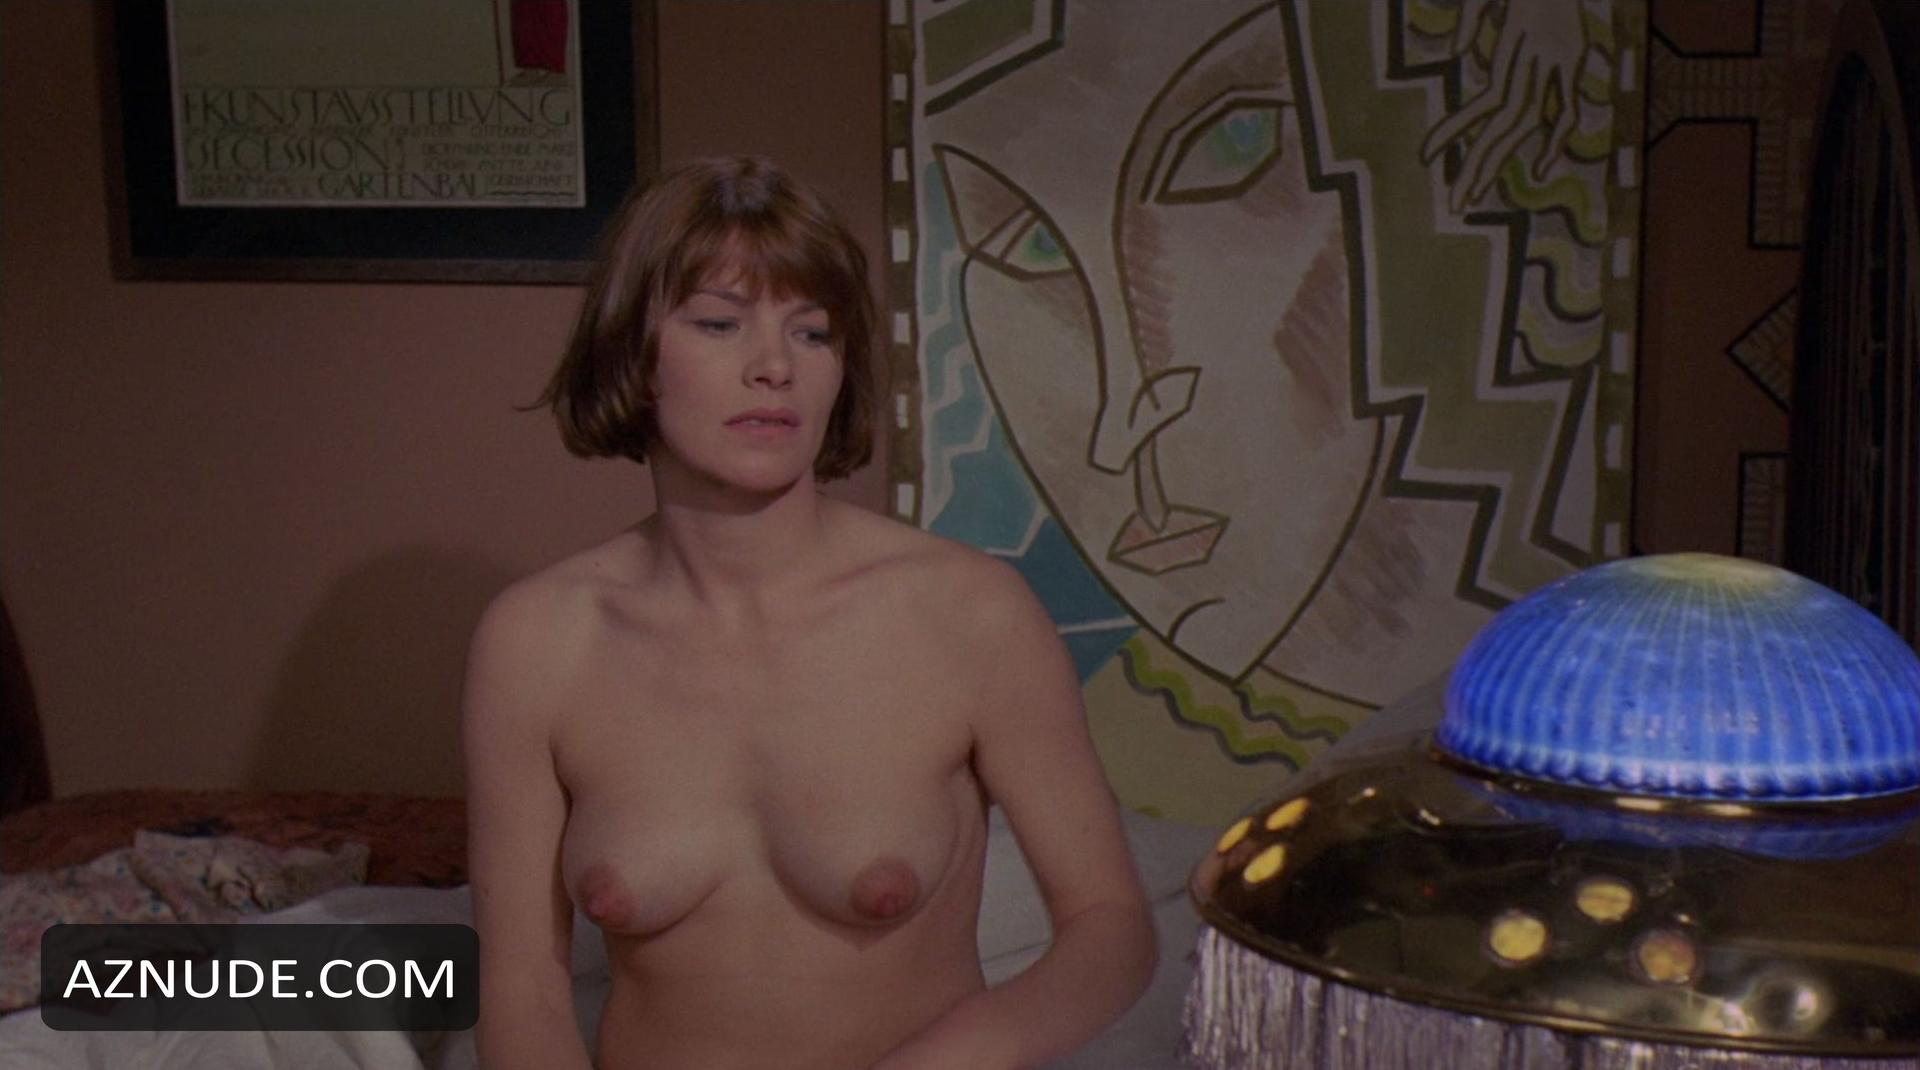 Amateur nude thumb gallery